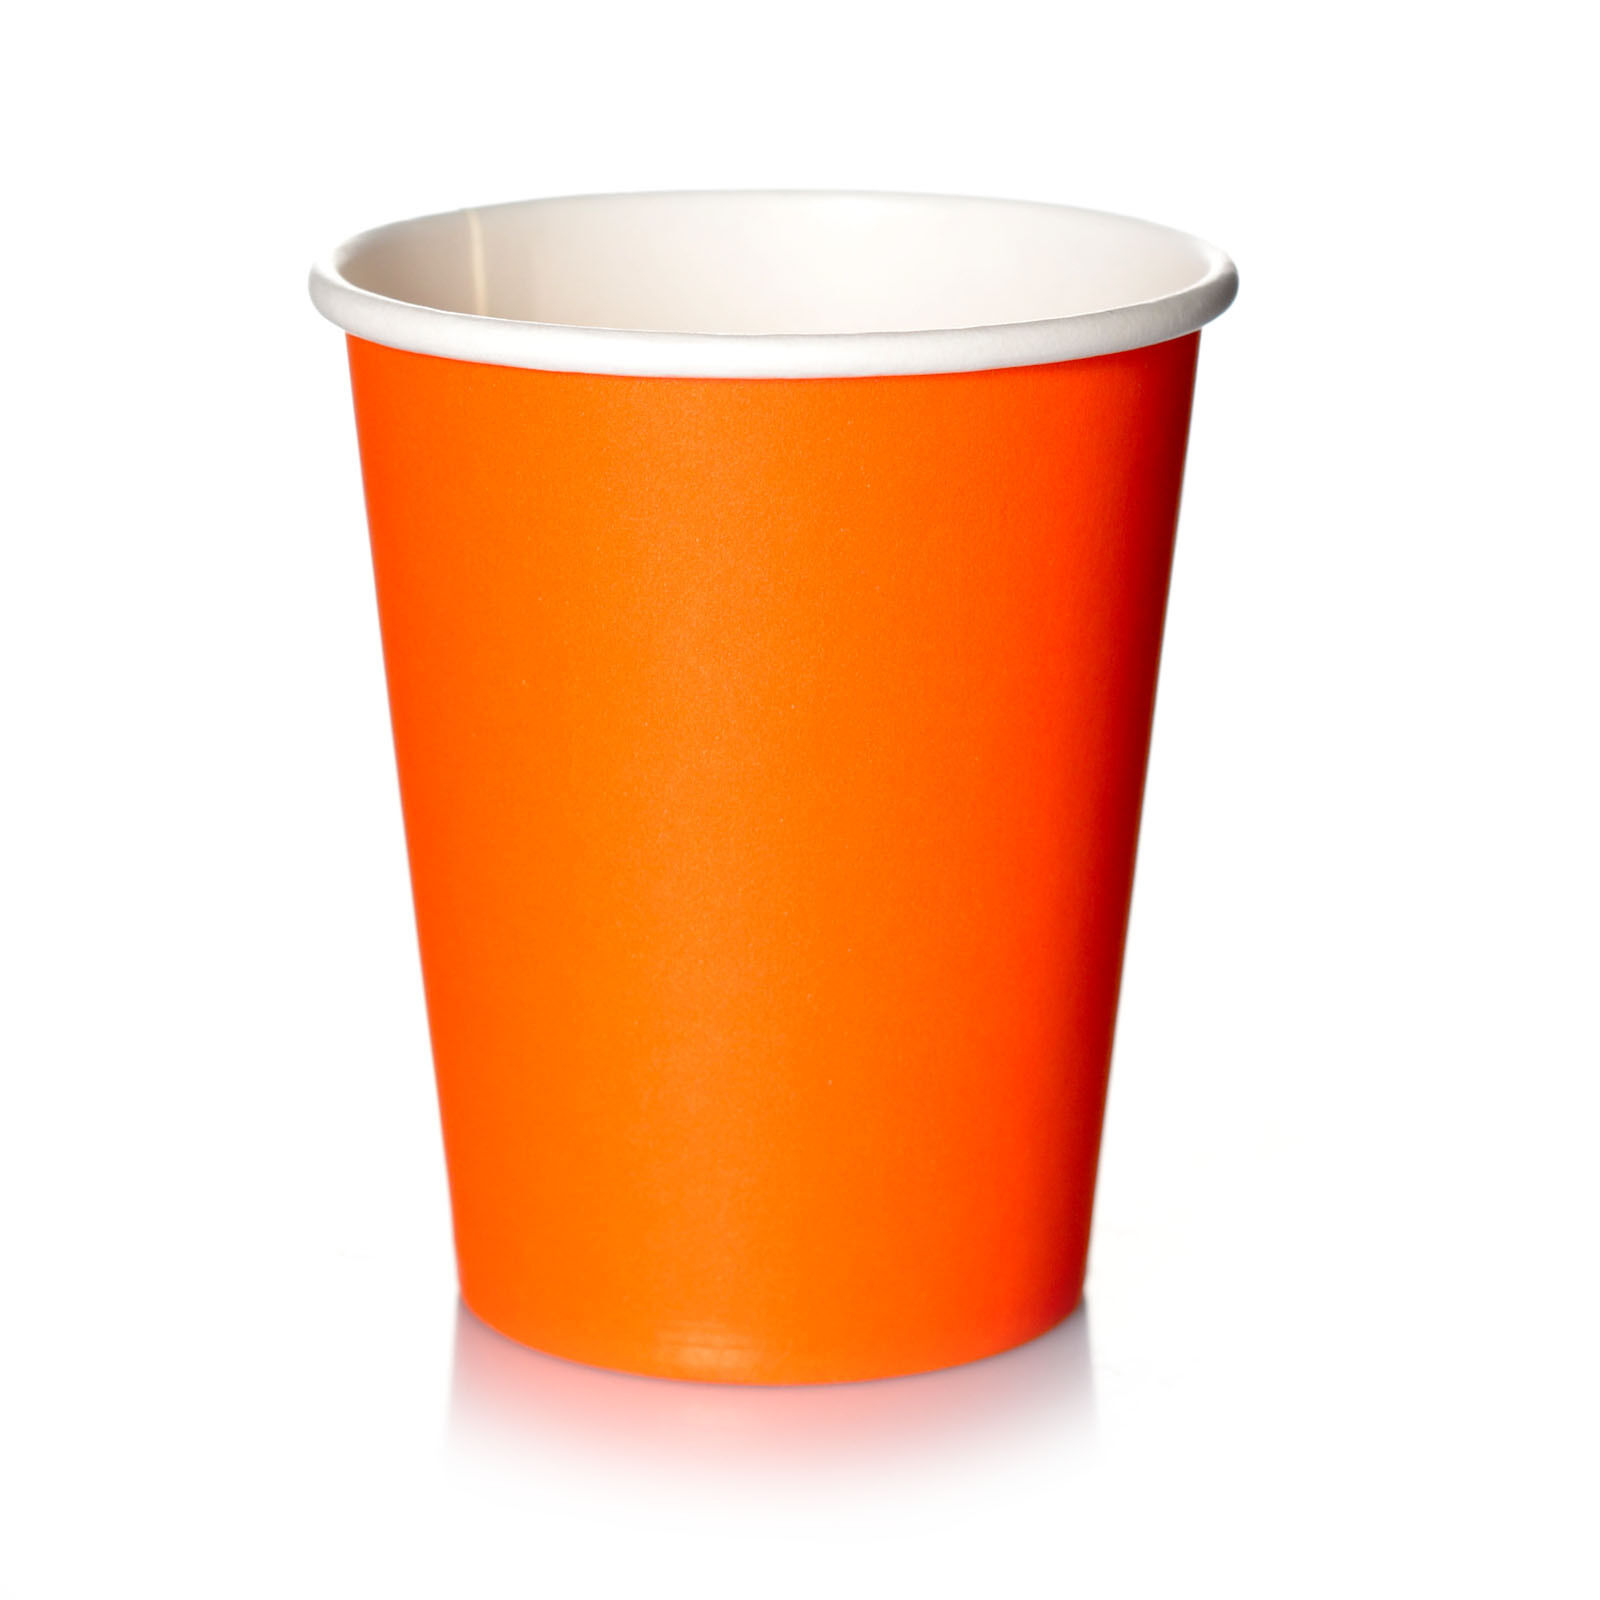 100 600 kaffeebecher coffee to go becher 0 2l 0 4l pappbecher orange ebay. Black Bedroom Furniture Sets. Home Design Ideas